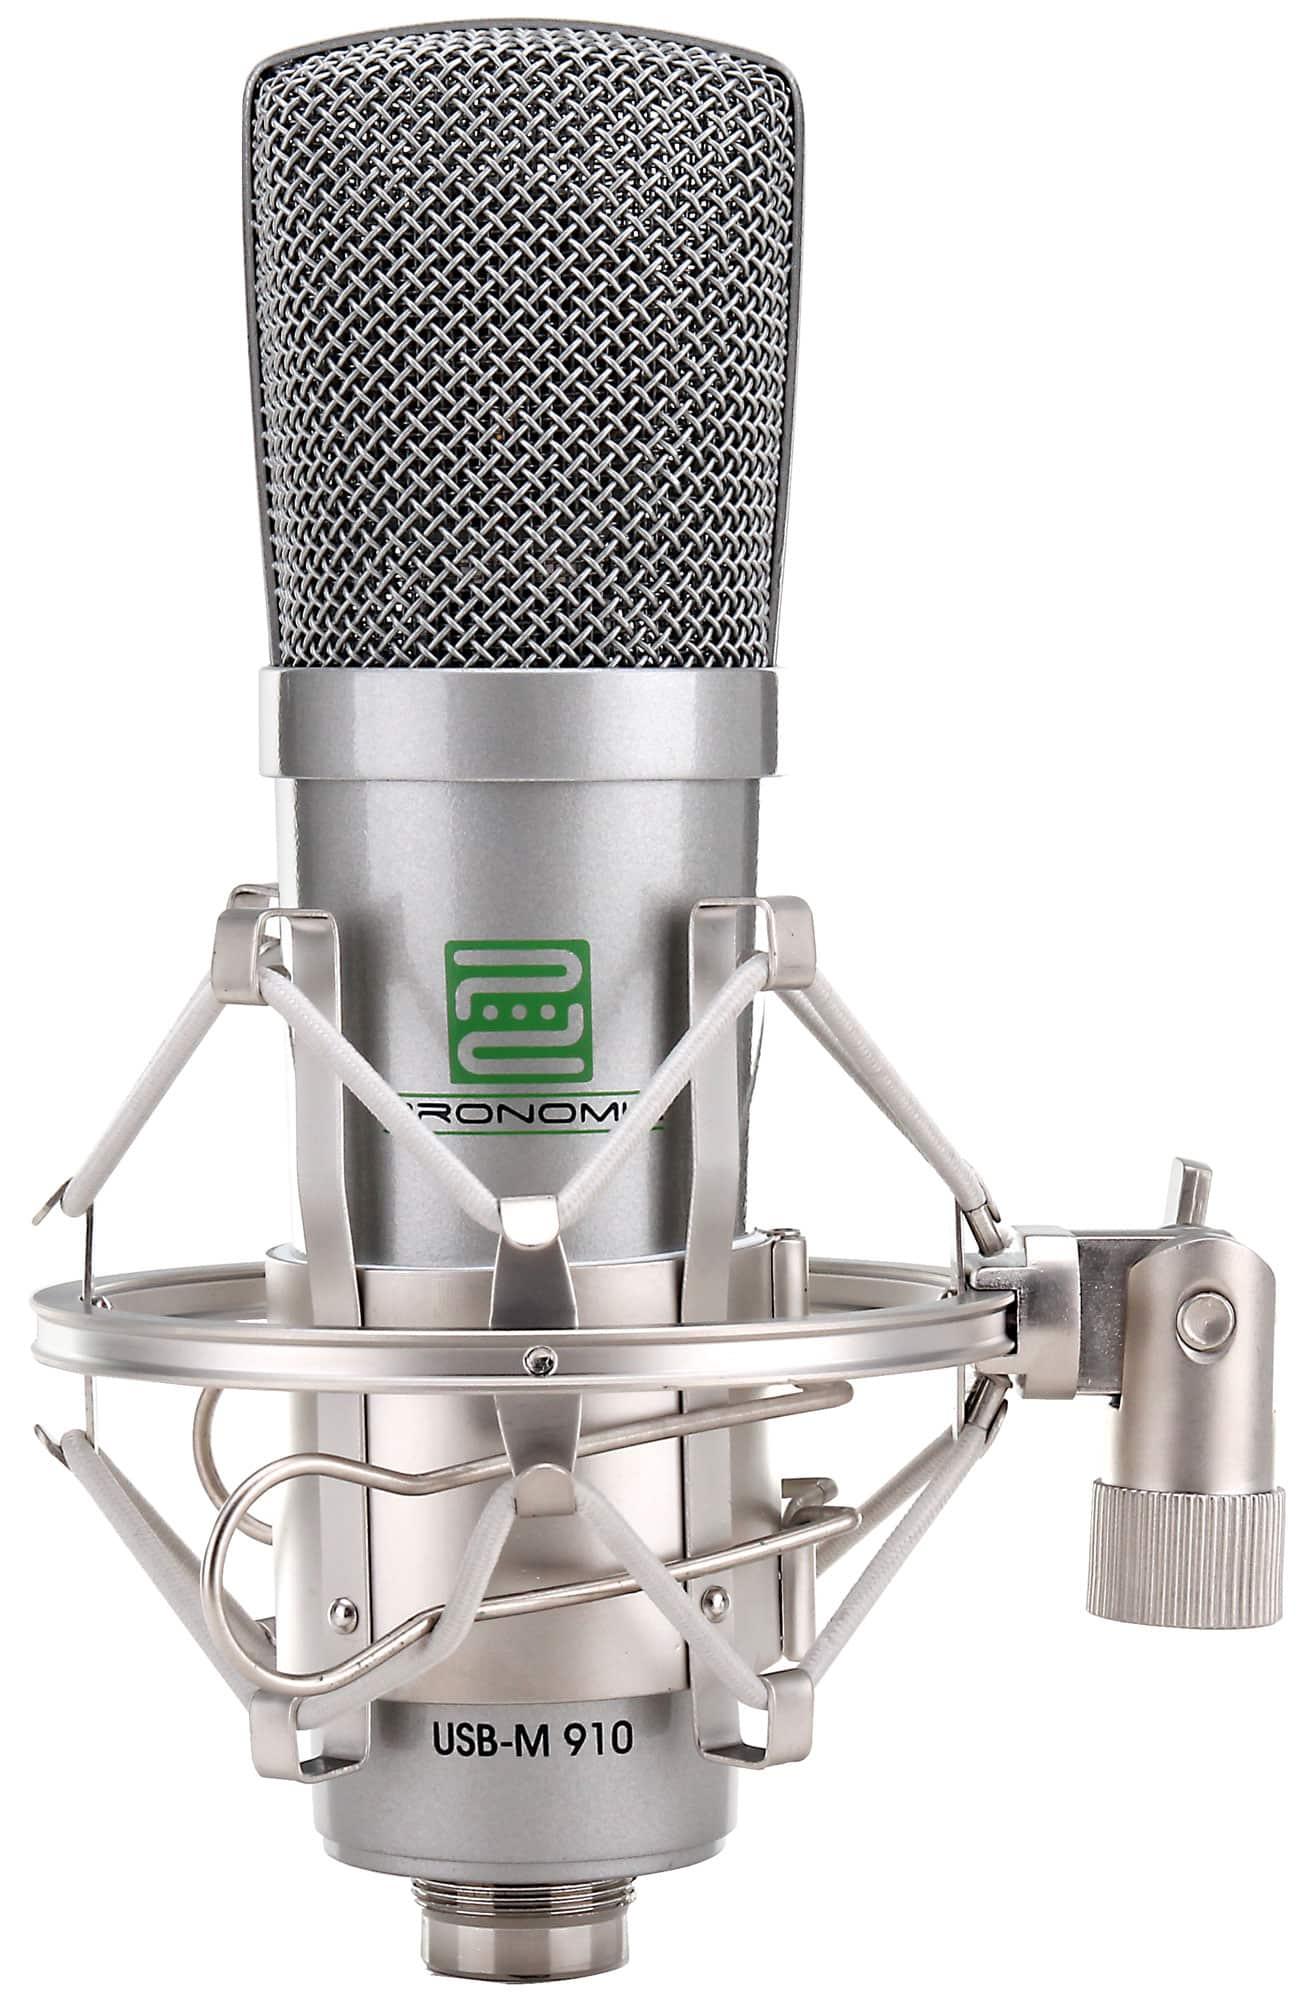 Mikrofone - Pronomic USB M 910 Podcast Kondensatormikrofon - Onlineshop Musikhaus Kirstein